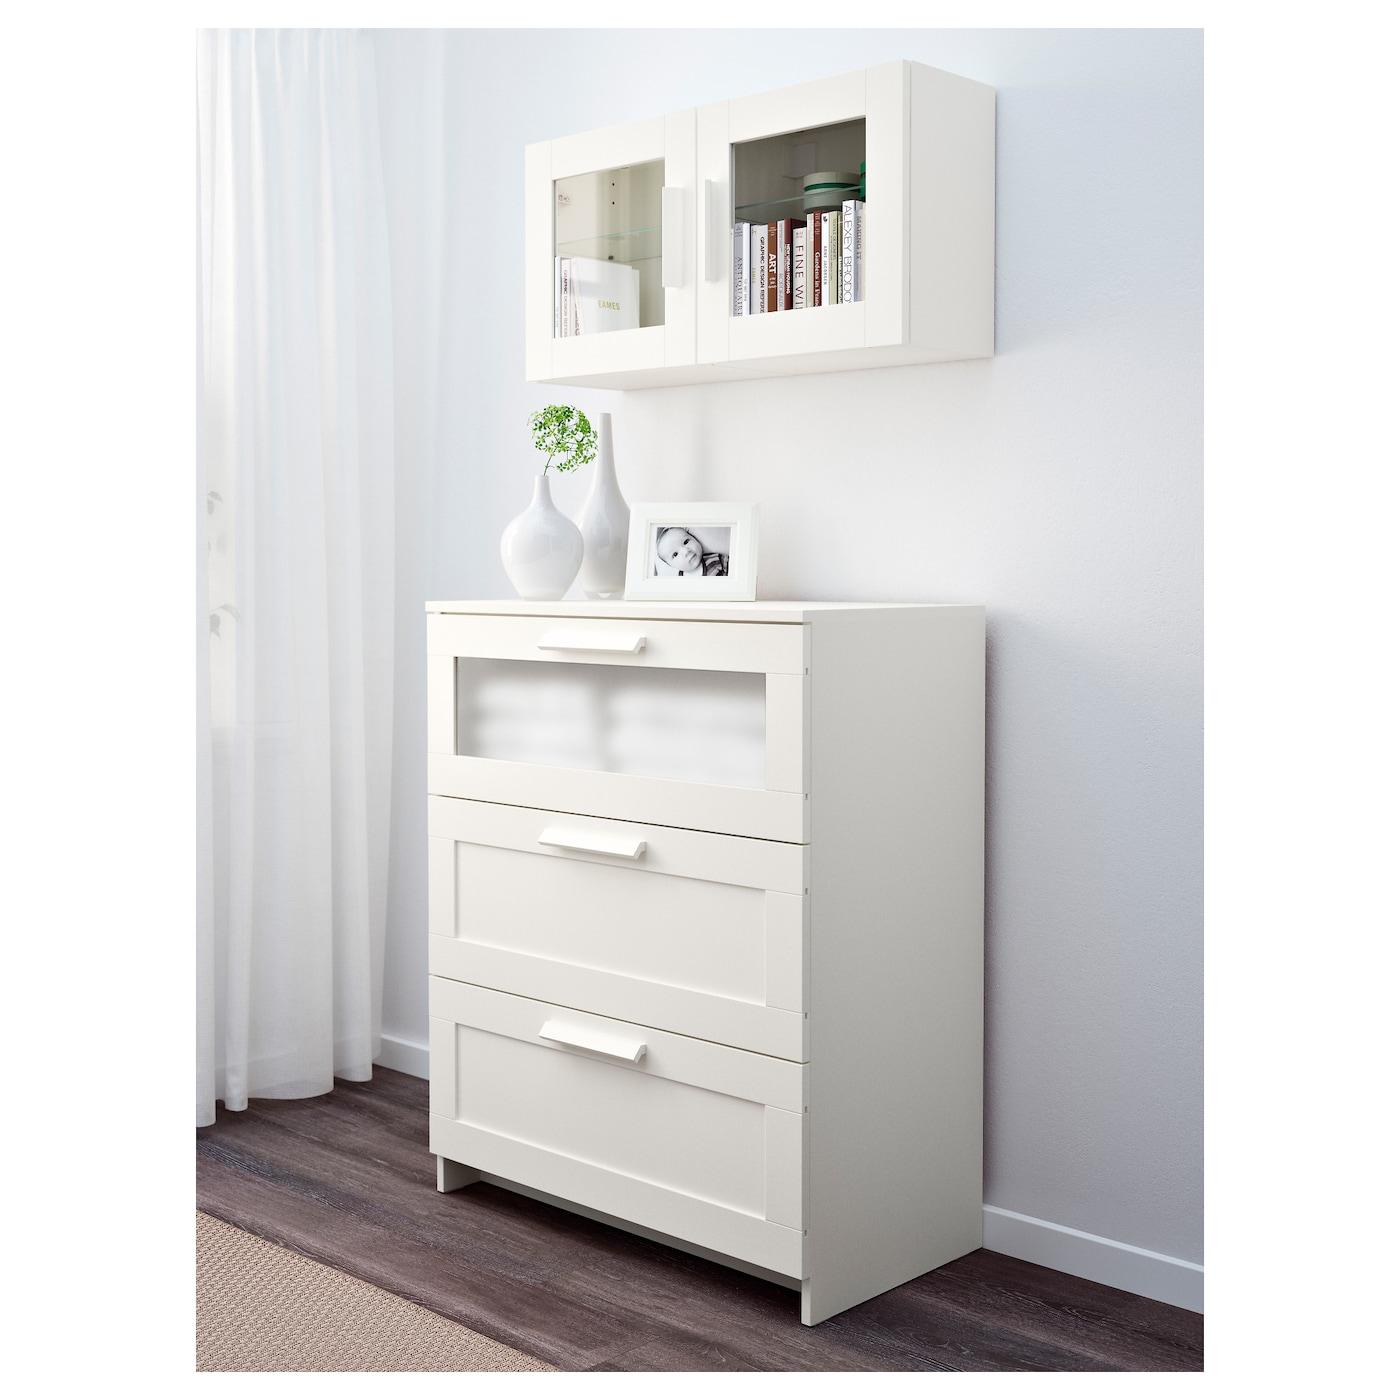 brimnes l ment mural porte vitr e blanc 39x39 cm ikea. Black Bedroom Furniture Sets. Home Design Ideas